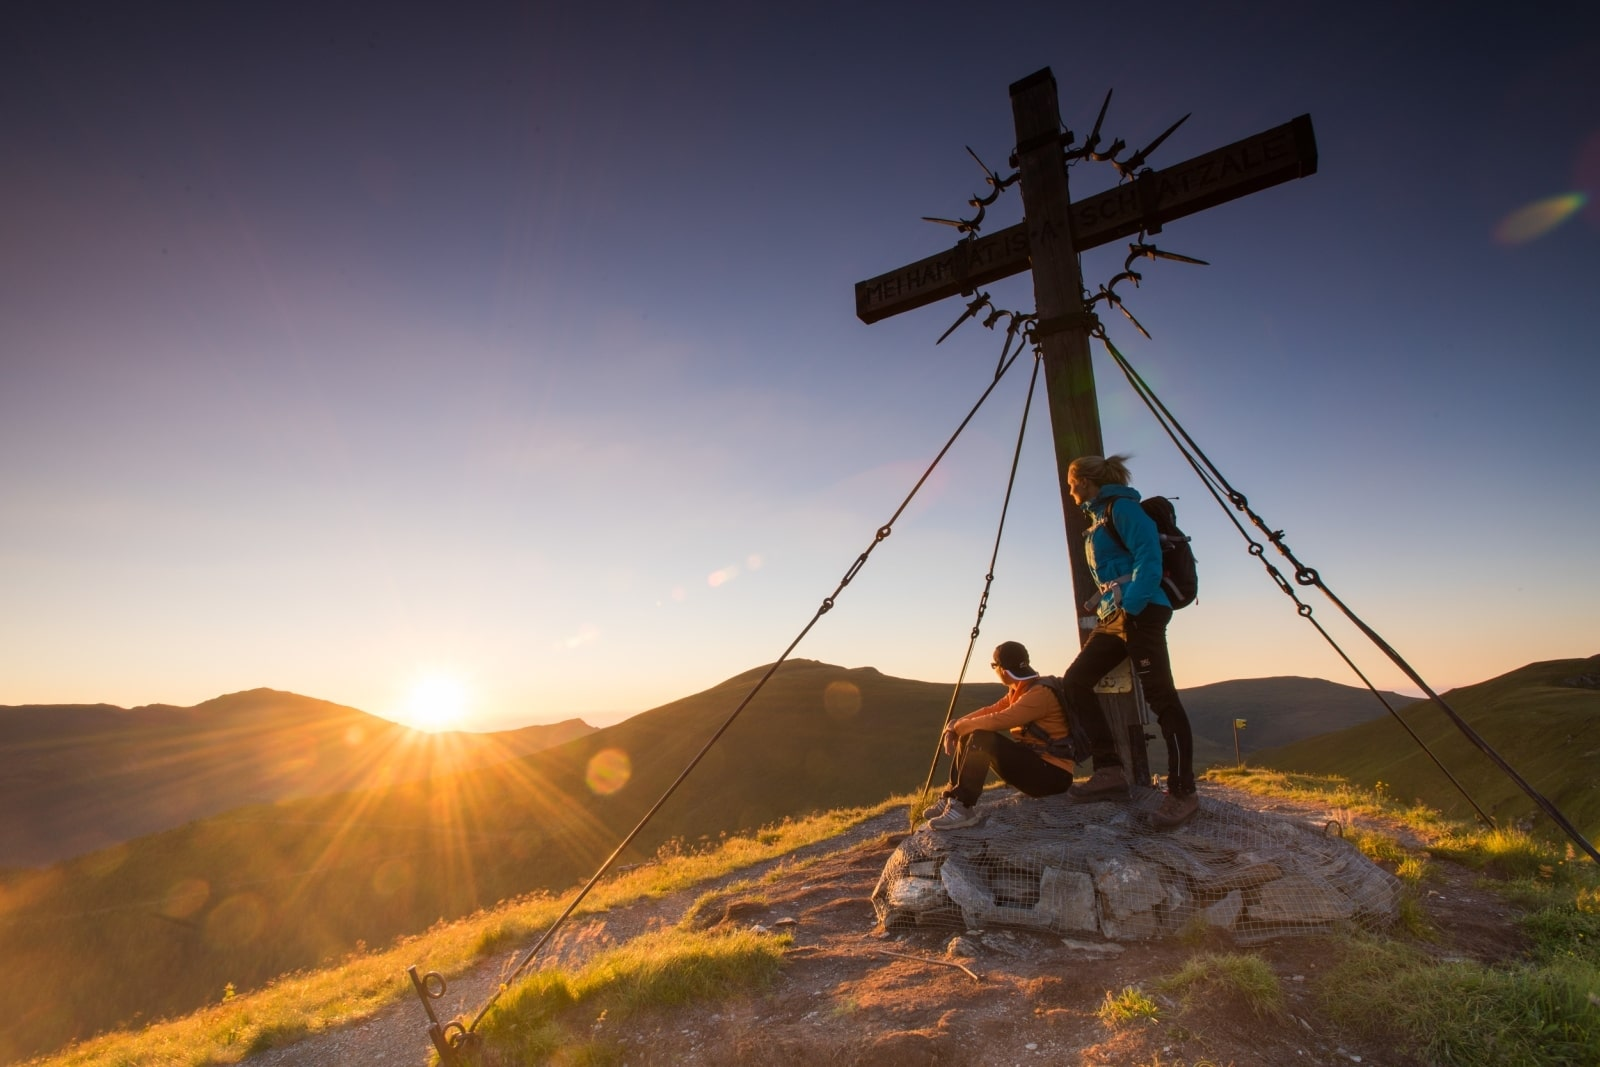 Heidi-Chalet-Falkert-Heidialm-Falkertsee-Blick-Gipfel-Kreuz-Sonnenuntergang